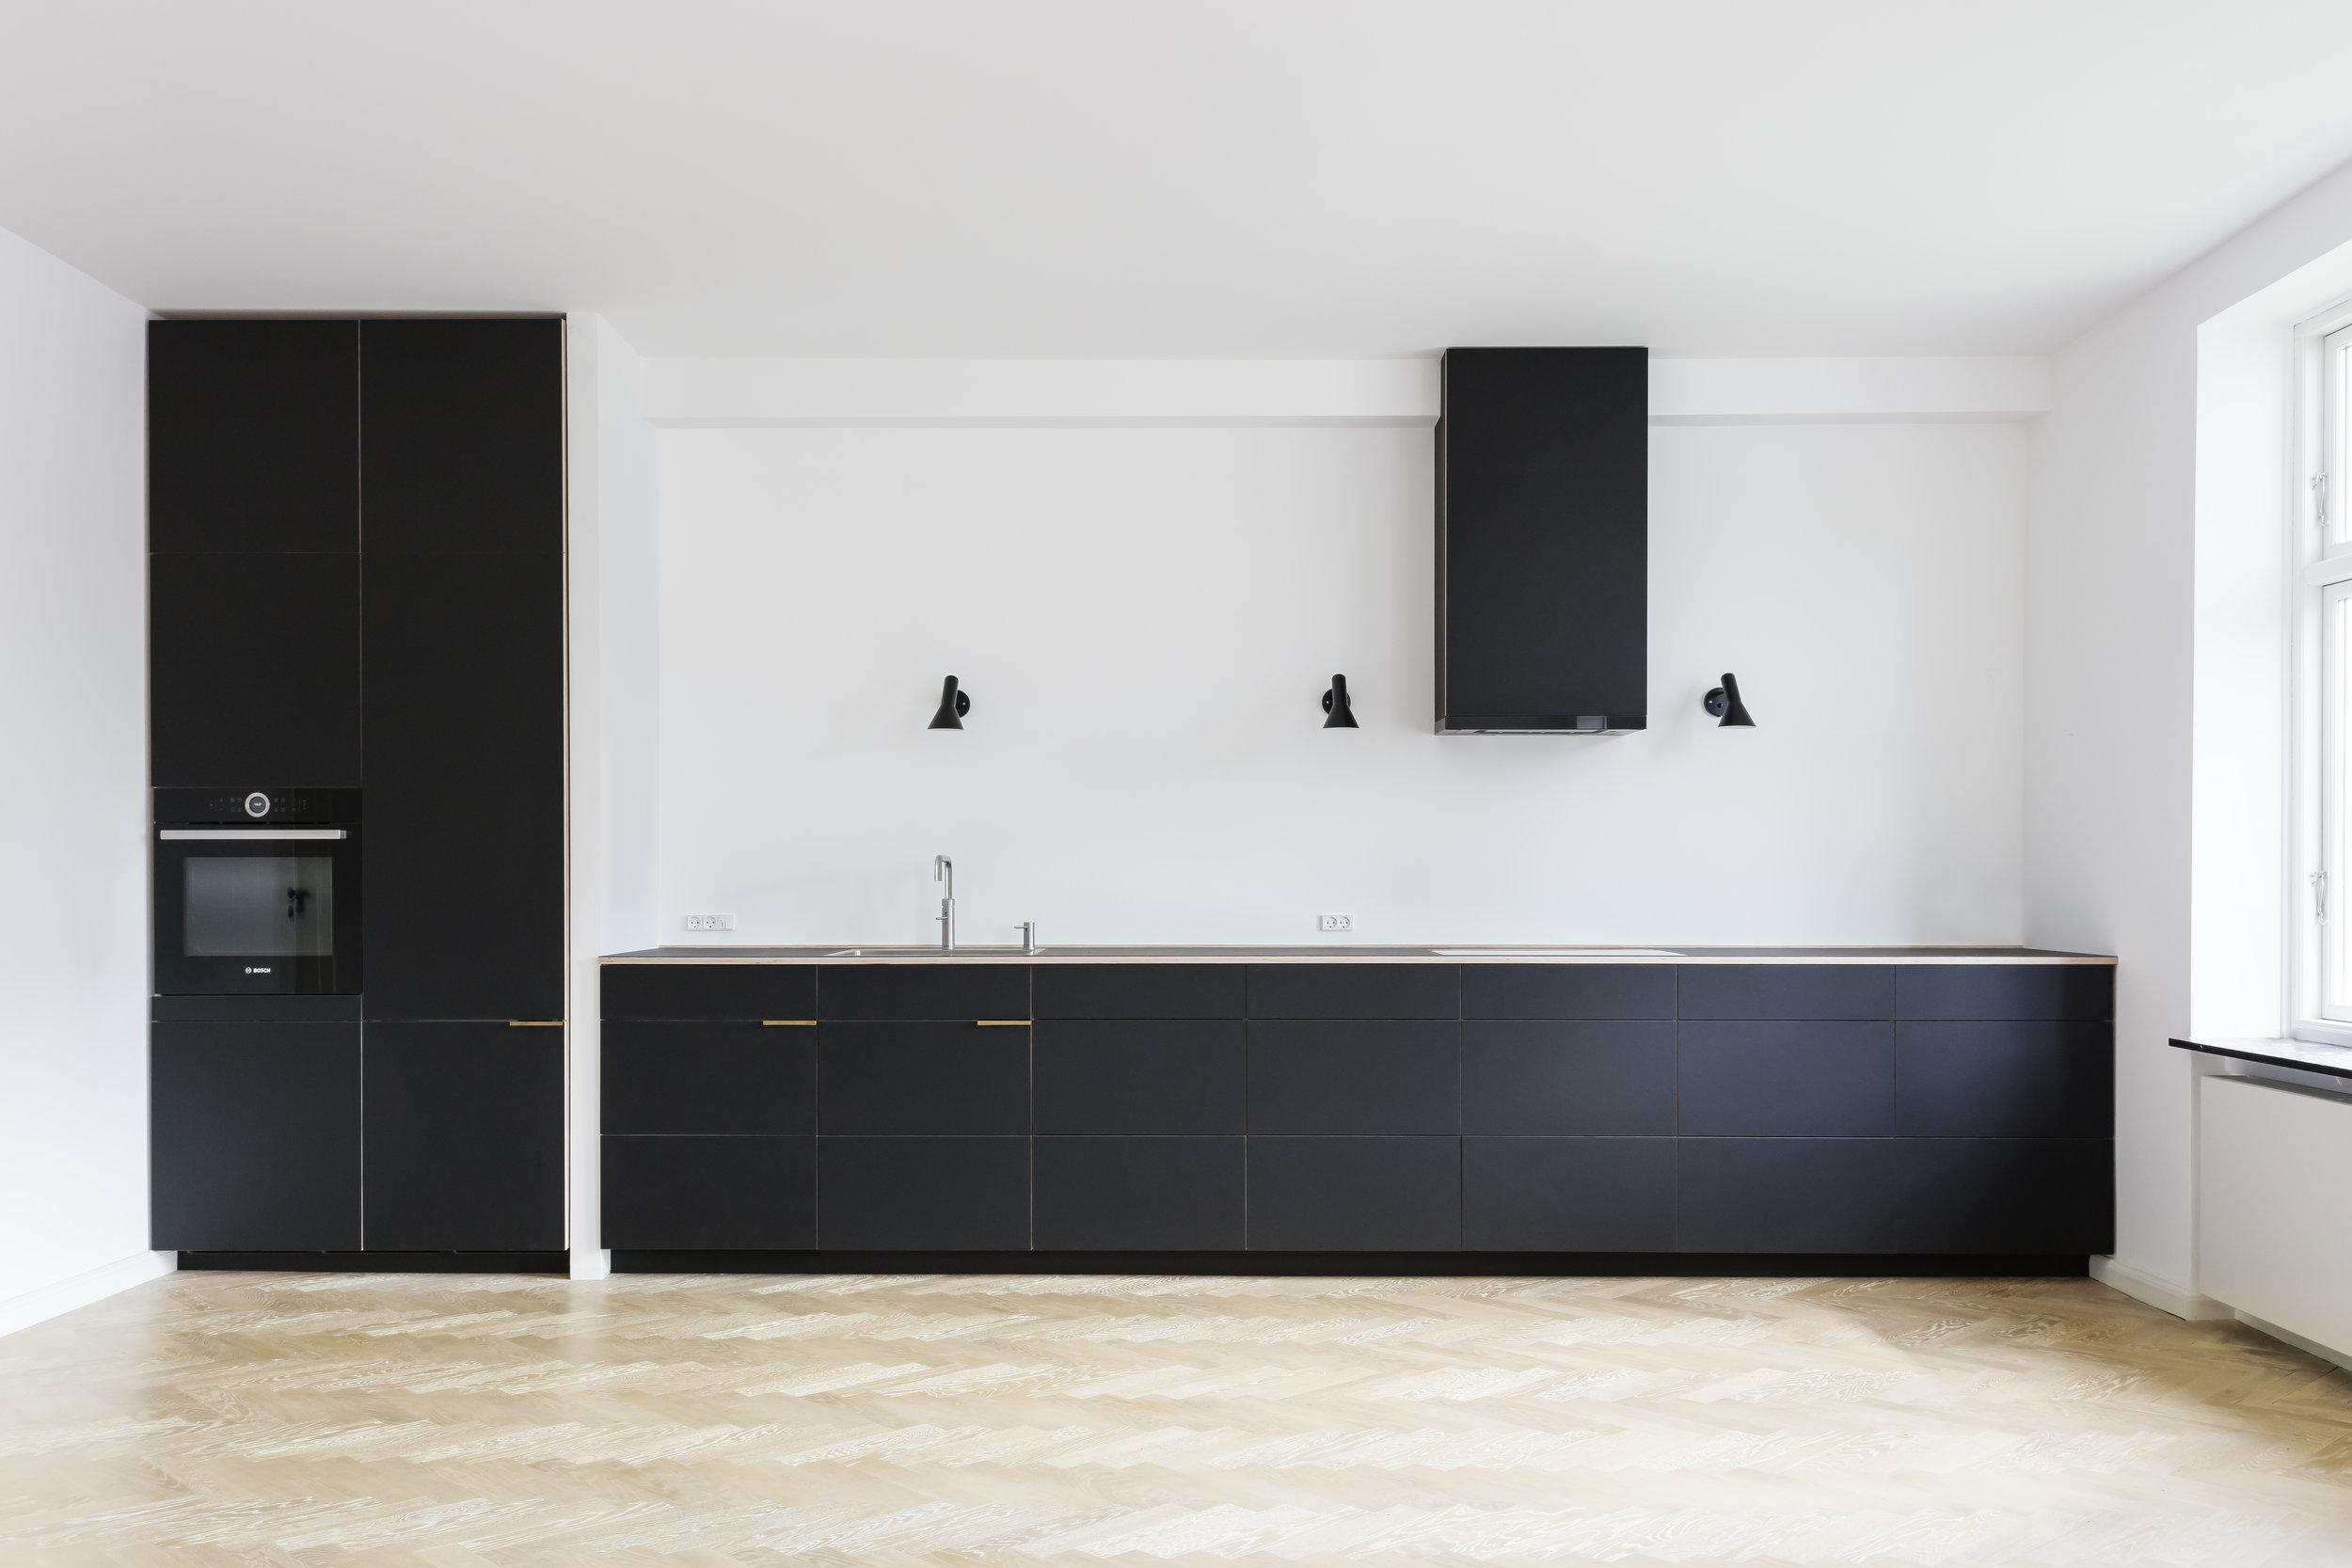 Køkken i sort linoleum